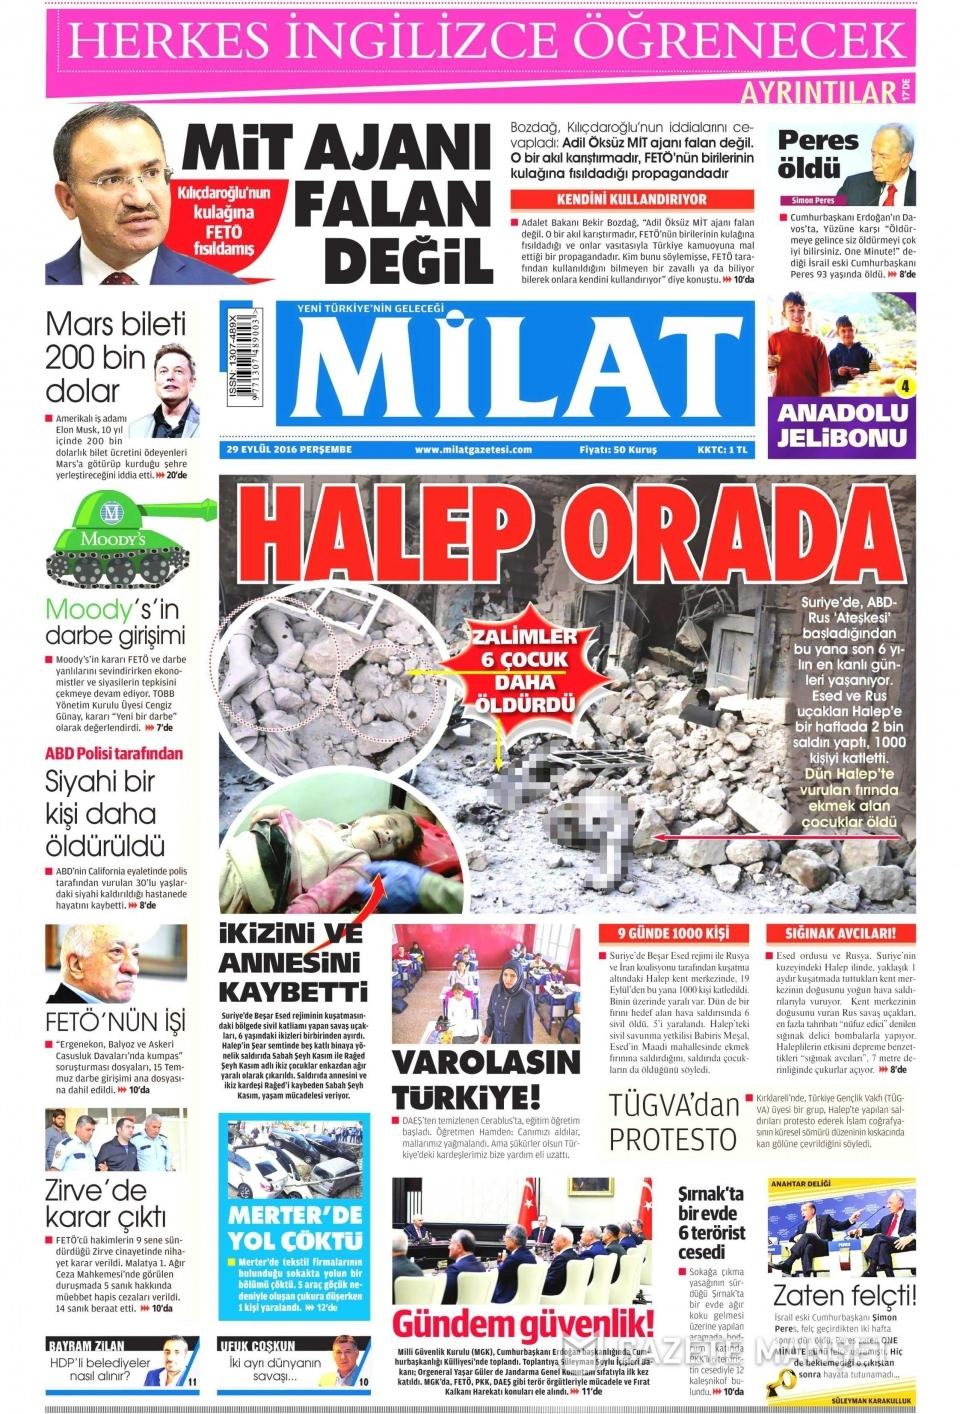 29 Eylül Perşembe gazete manşetleri 16